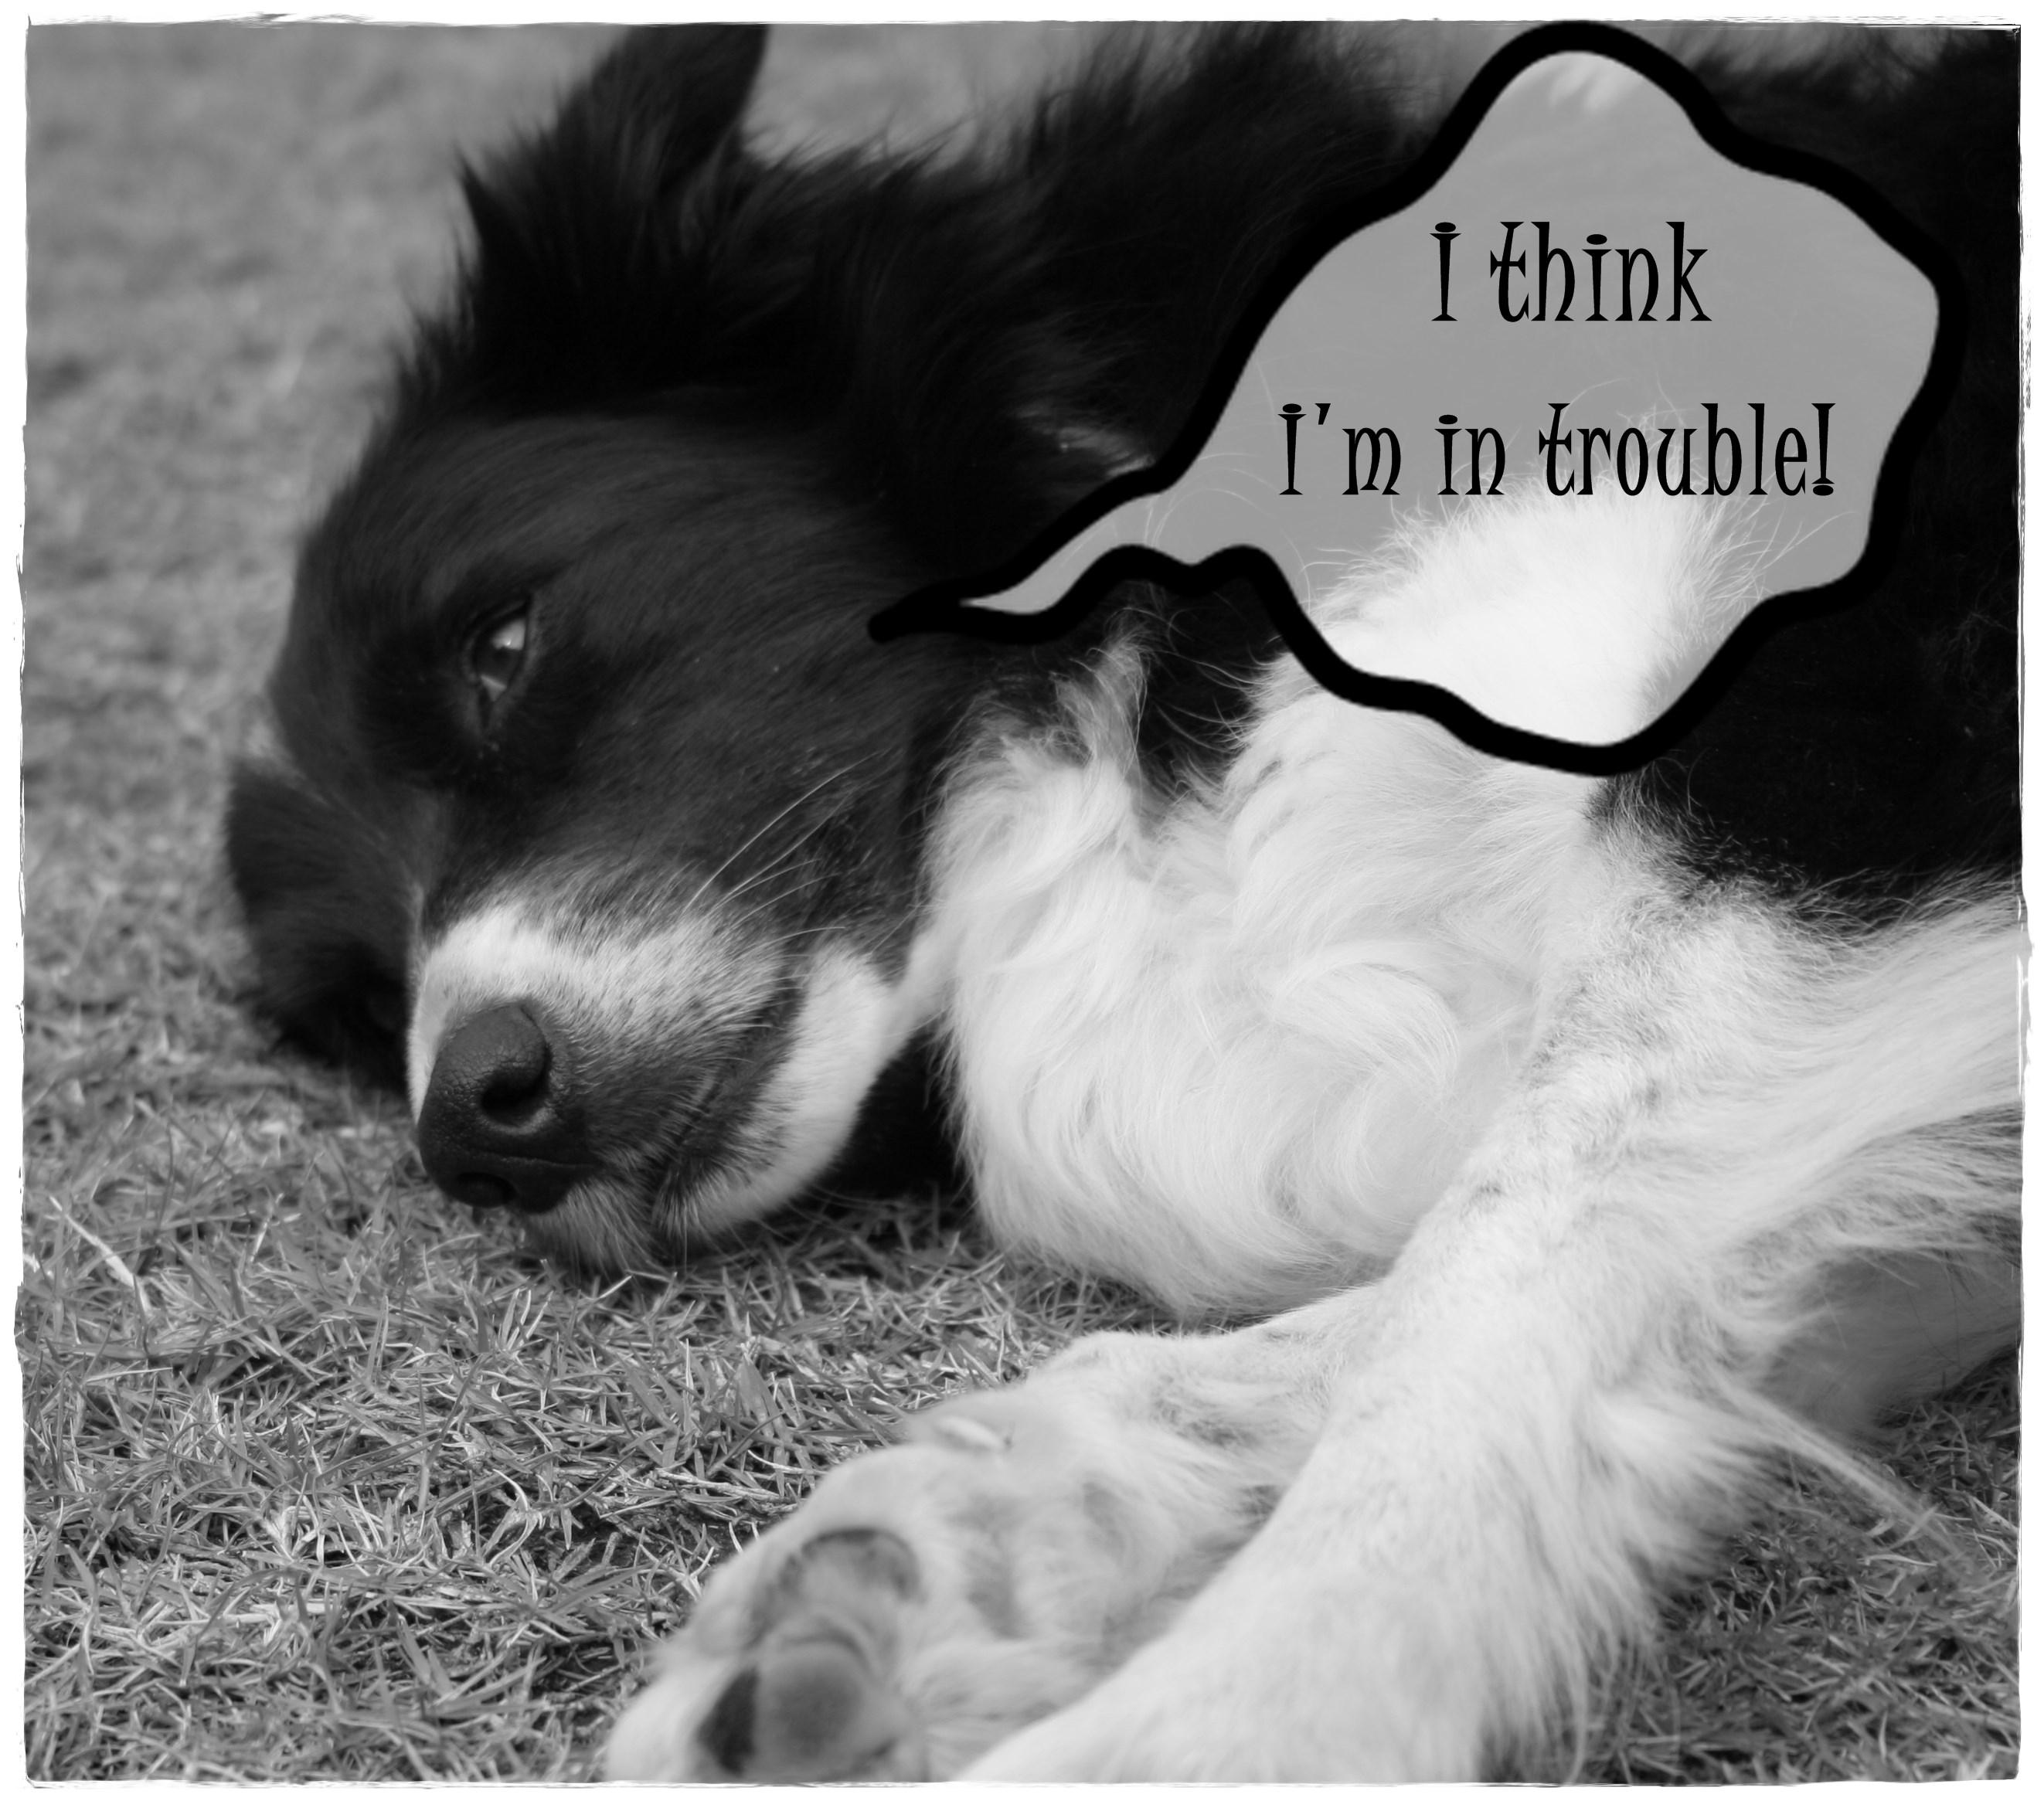 tpotg-jess-in-trouble-01